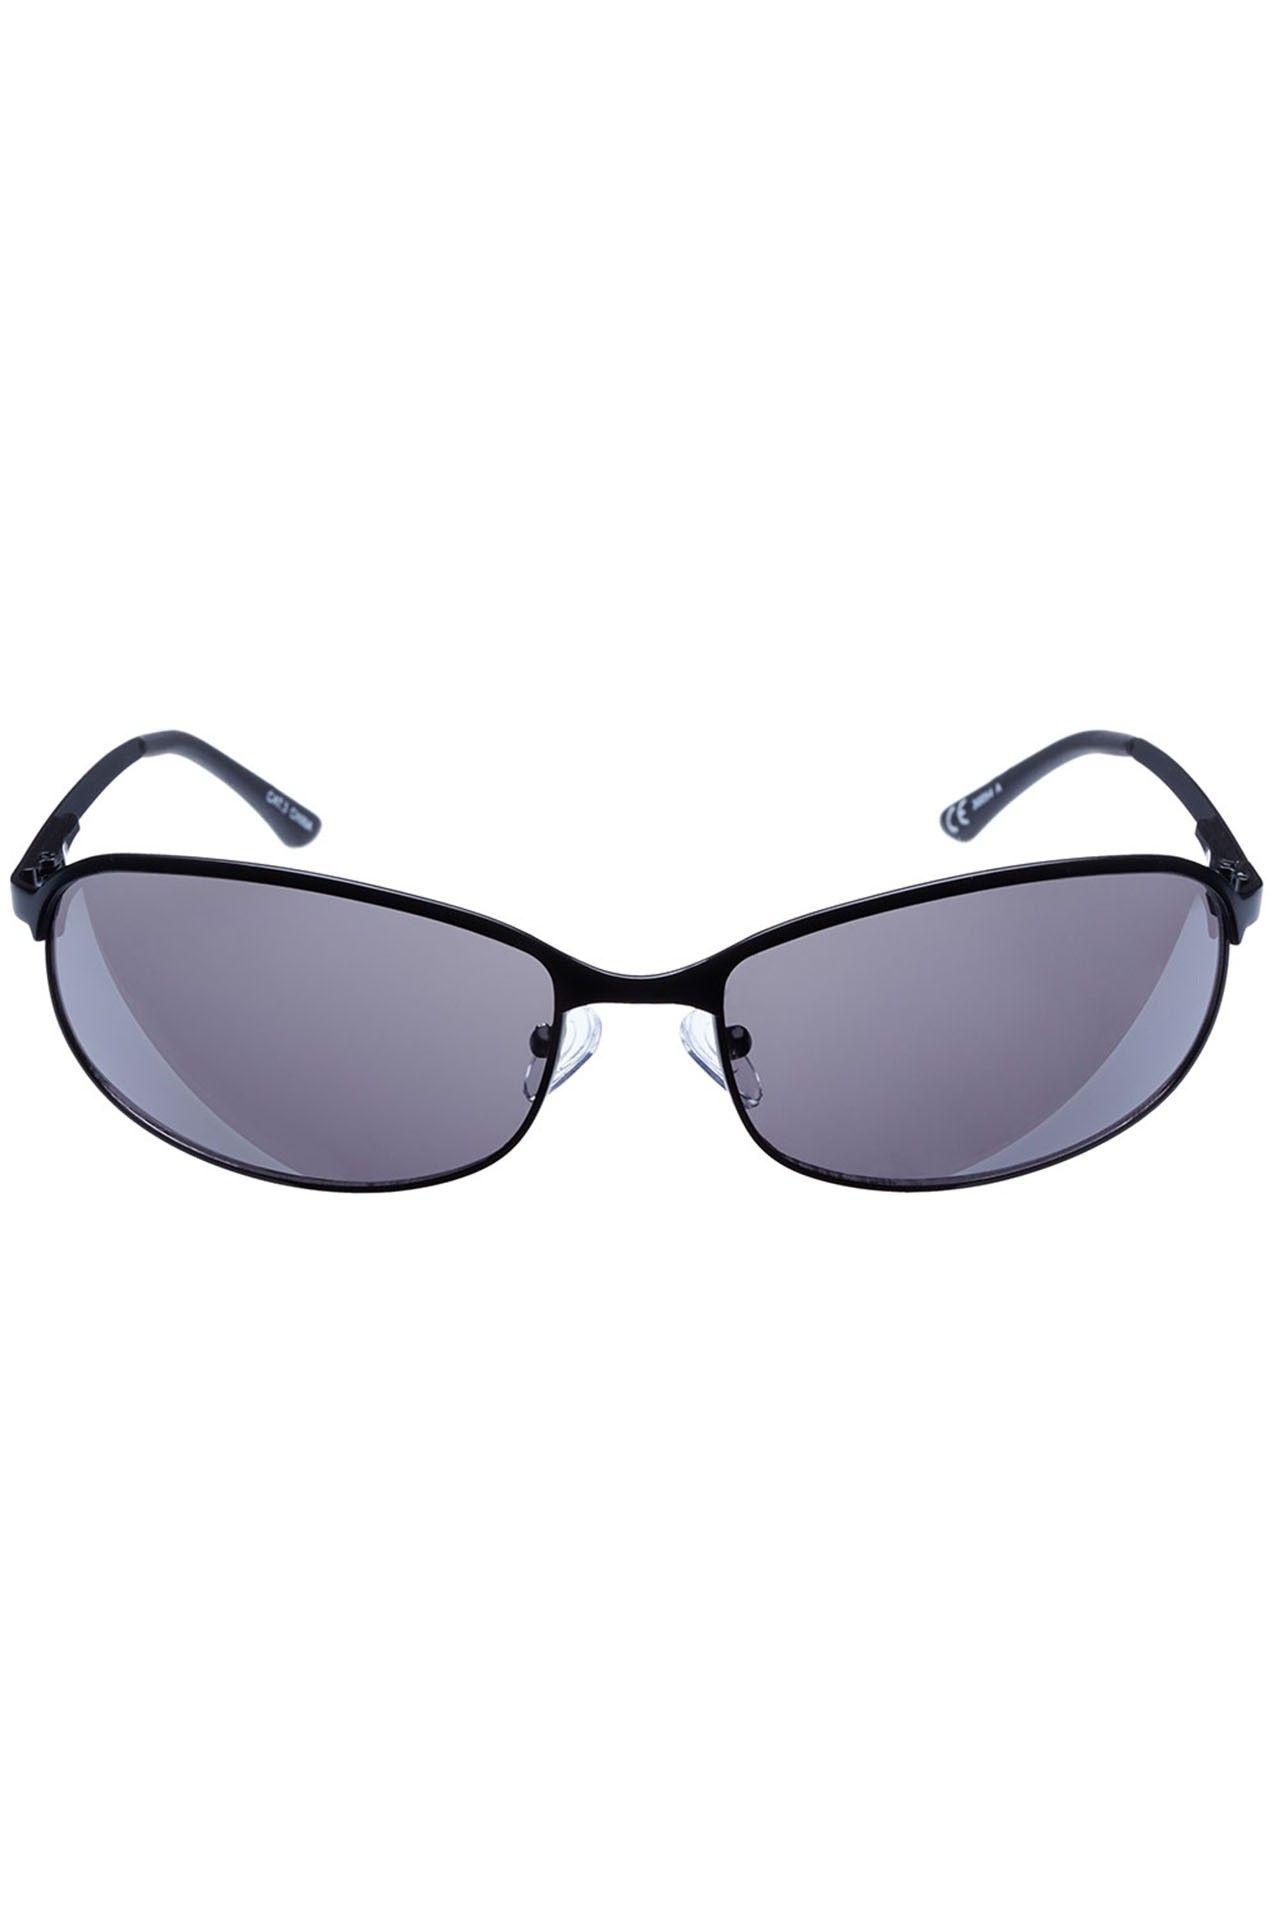 Afbeelding van Icon Eyewear Zonnebril 30054 Matt Black Metal A